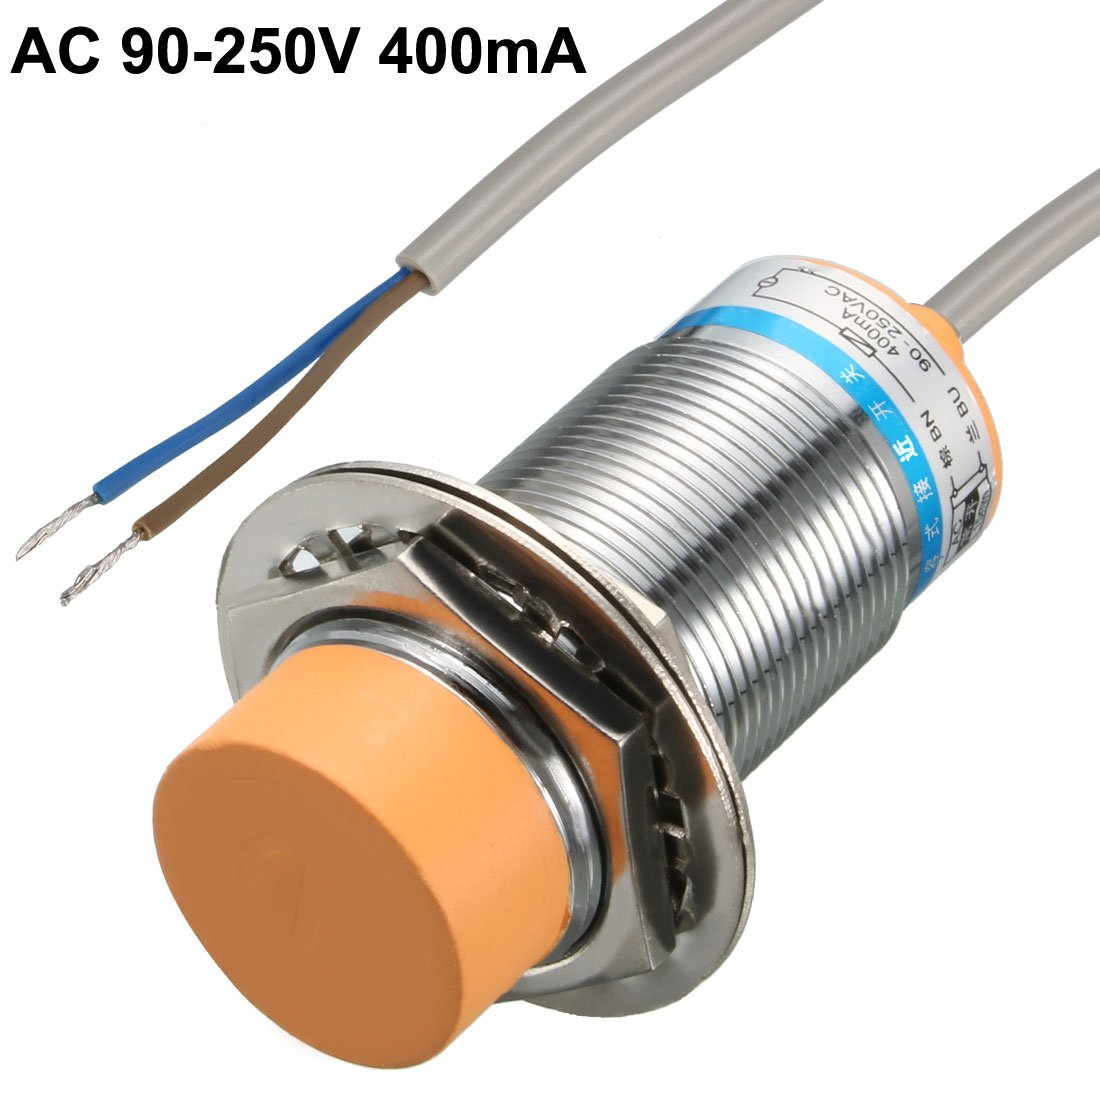 uxcell LJC18A3-B-J//DZ 2-Wire AC 90-250V 400mA 10mm NC Capacitance Proximity Sensor Switch a15120500ux0411